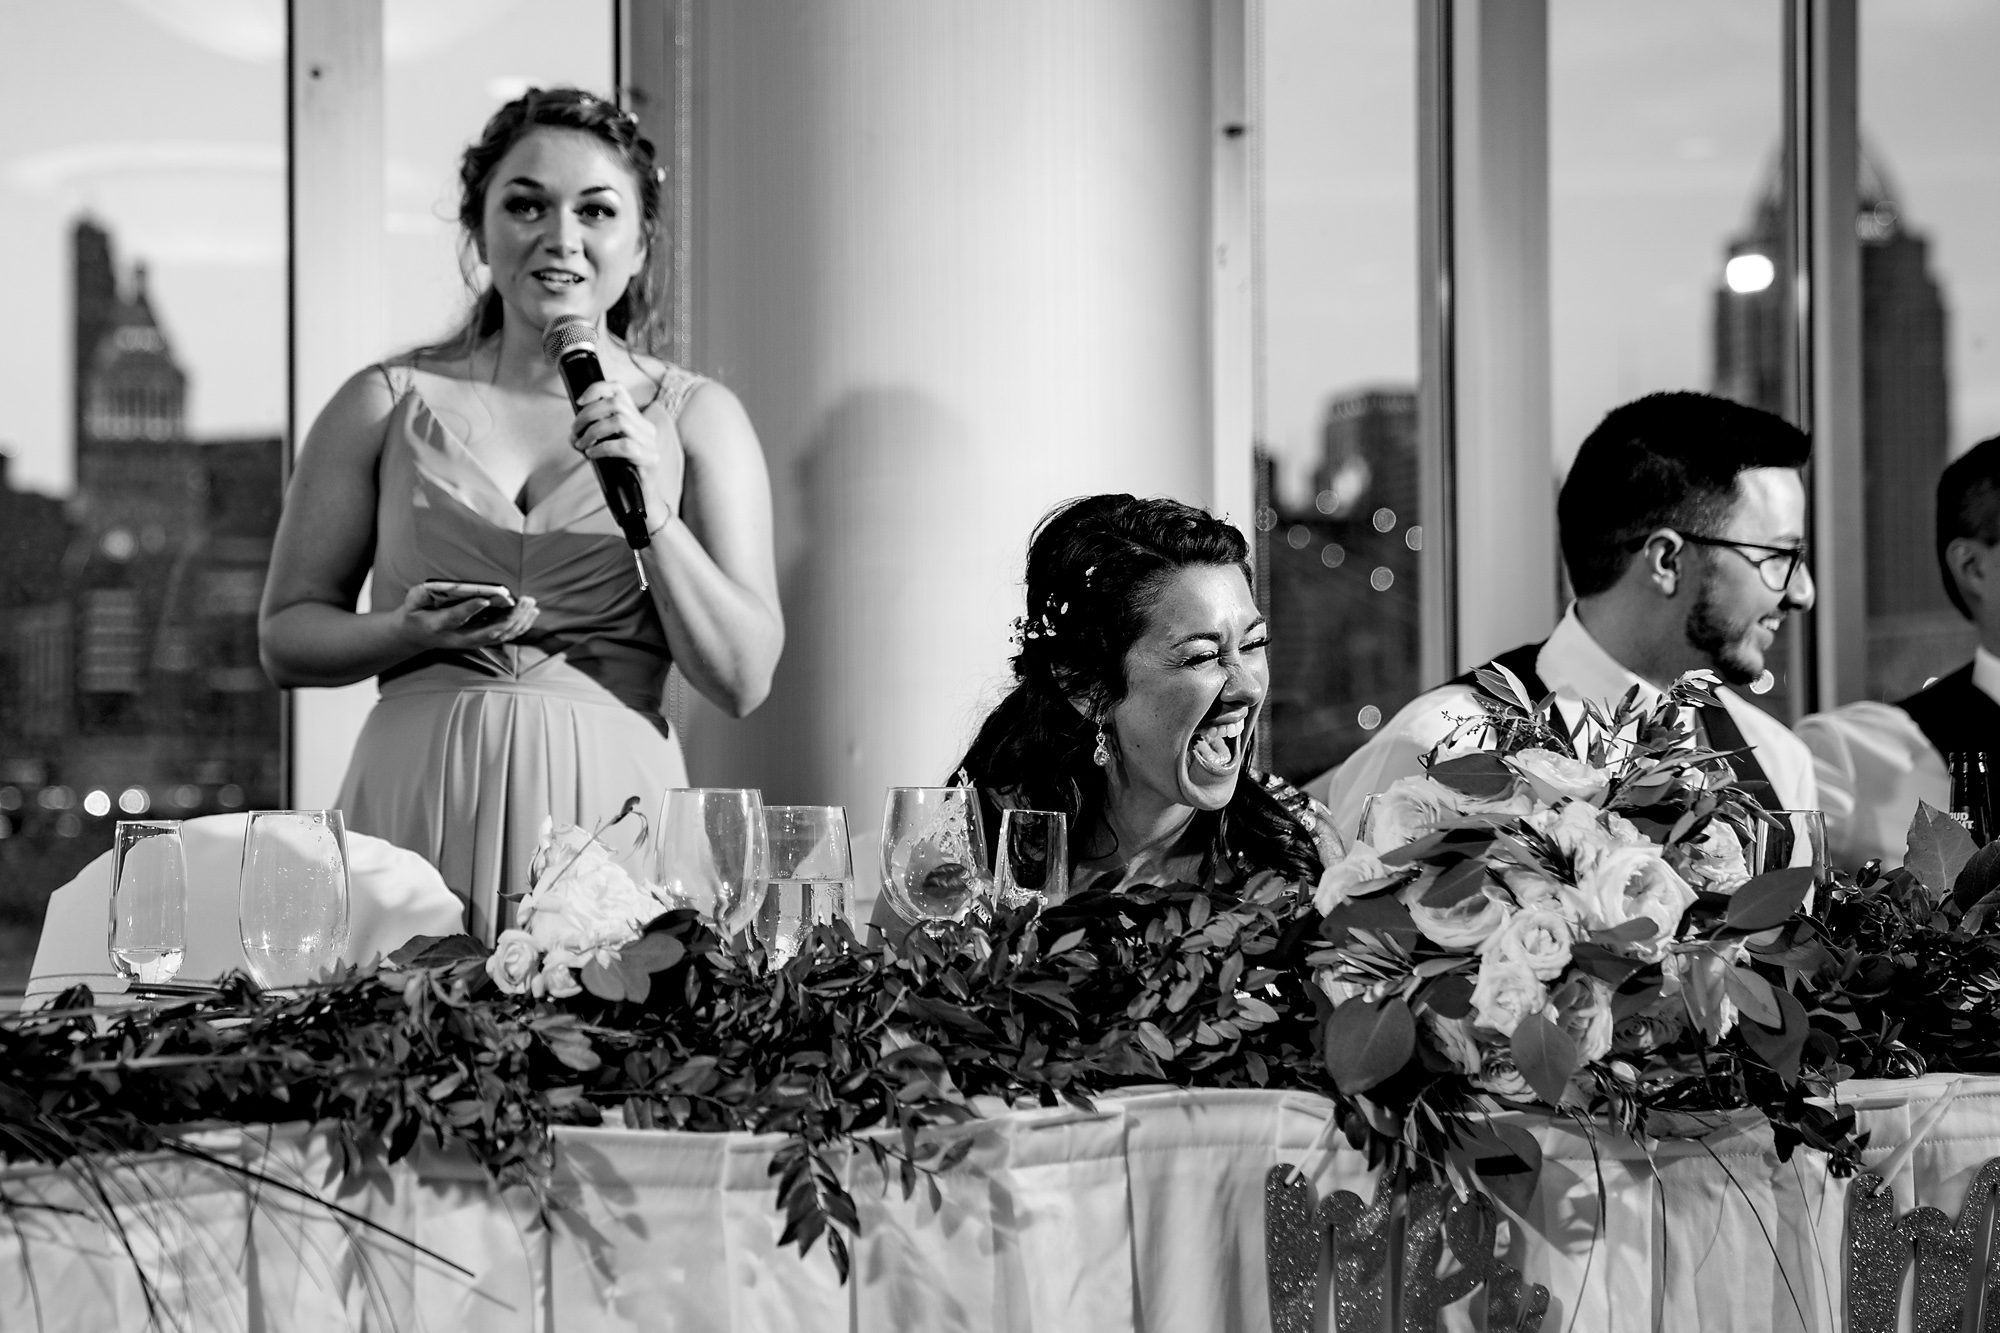 Embassy-Suites-Rivercenter-Wedding-Photography-33.jpg